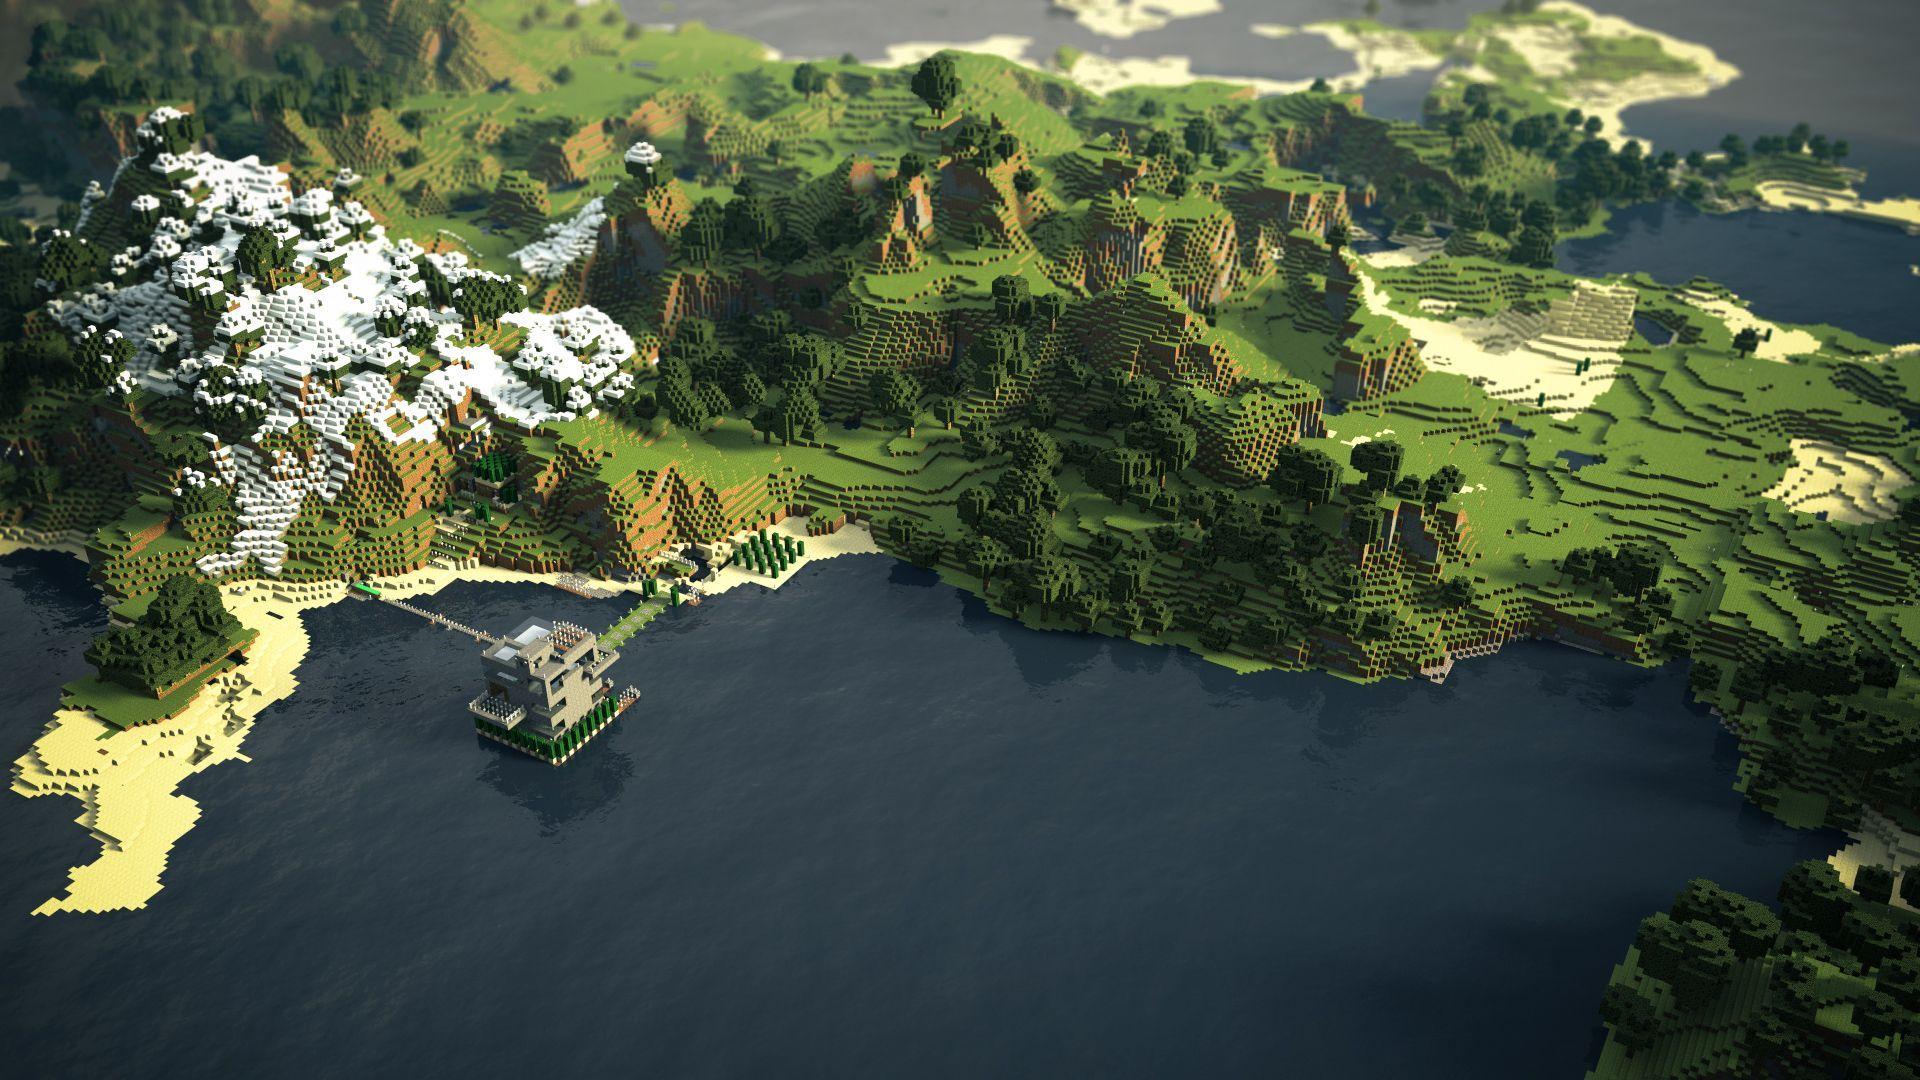 Pc Minecraft Wallpapers Carson Eykelhof